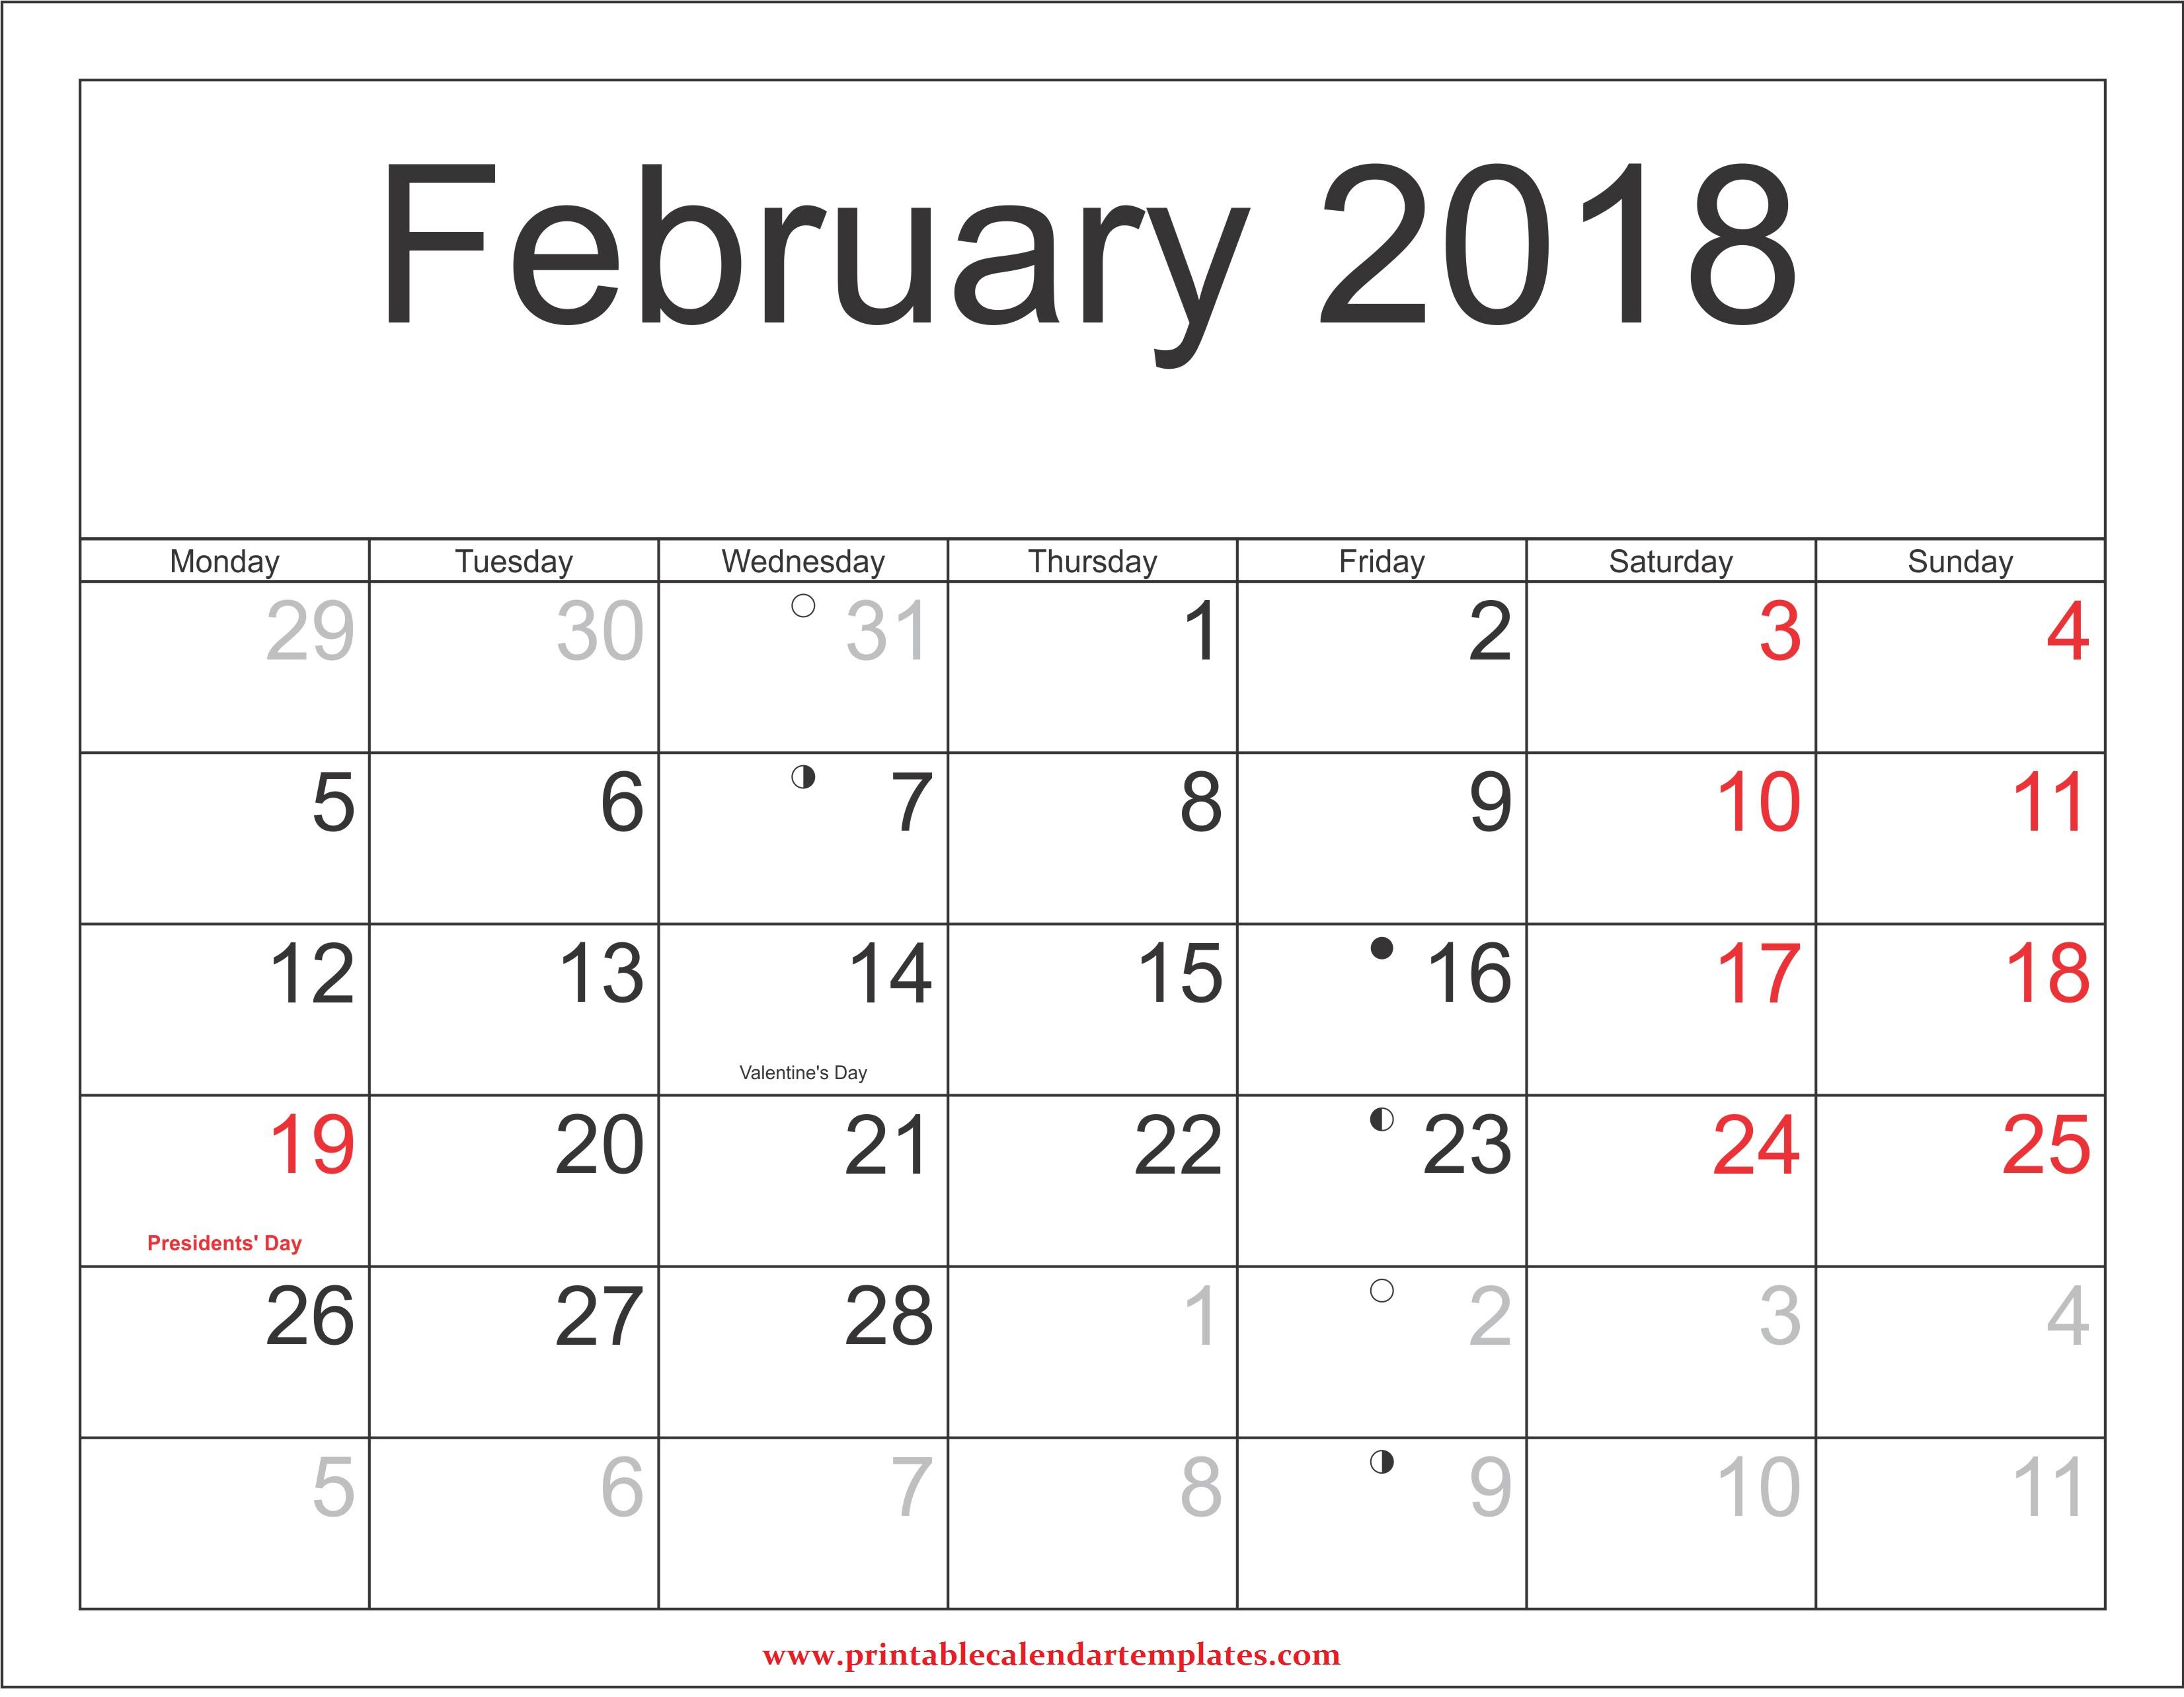 February-2018-Calendar-with-holidays-